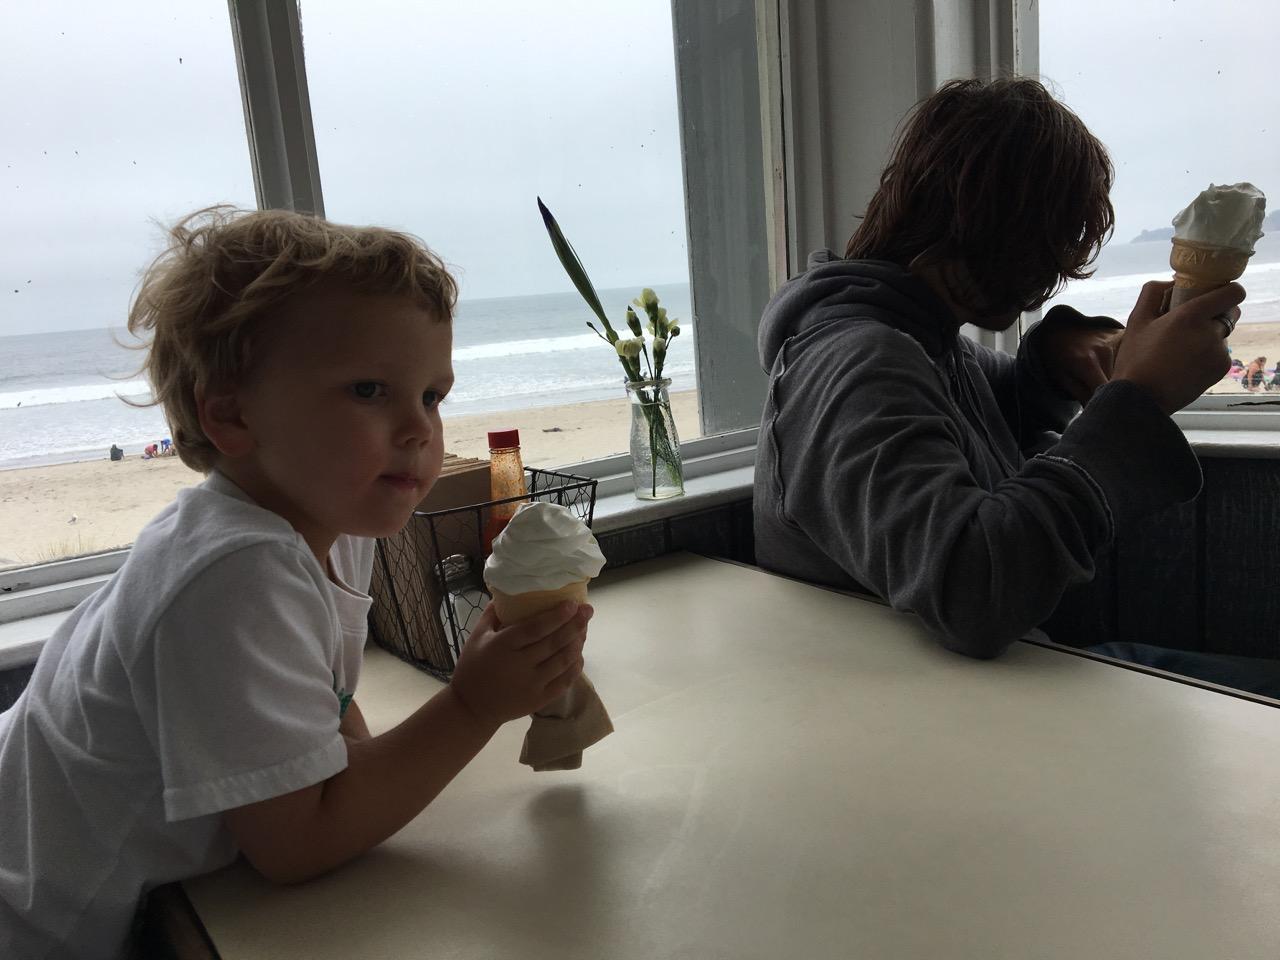 Ice cream at the beach (July)